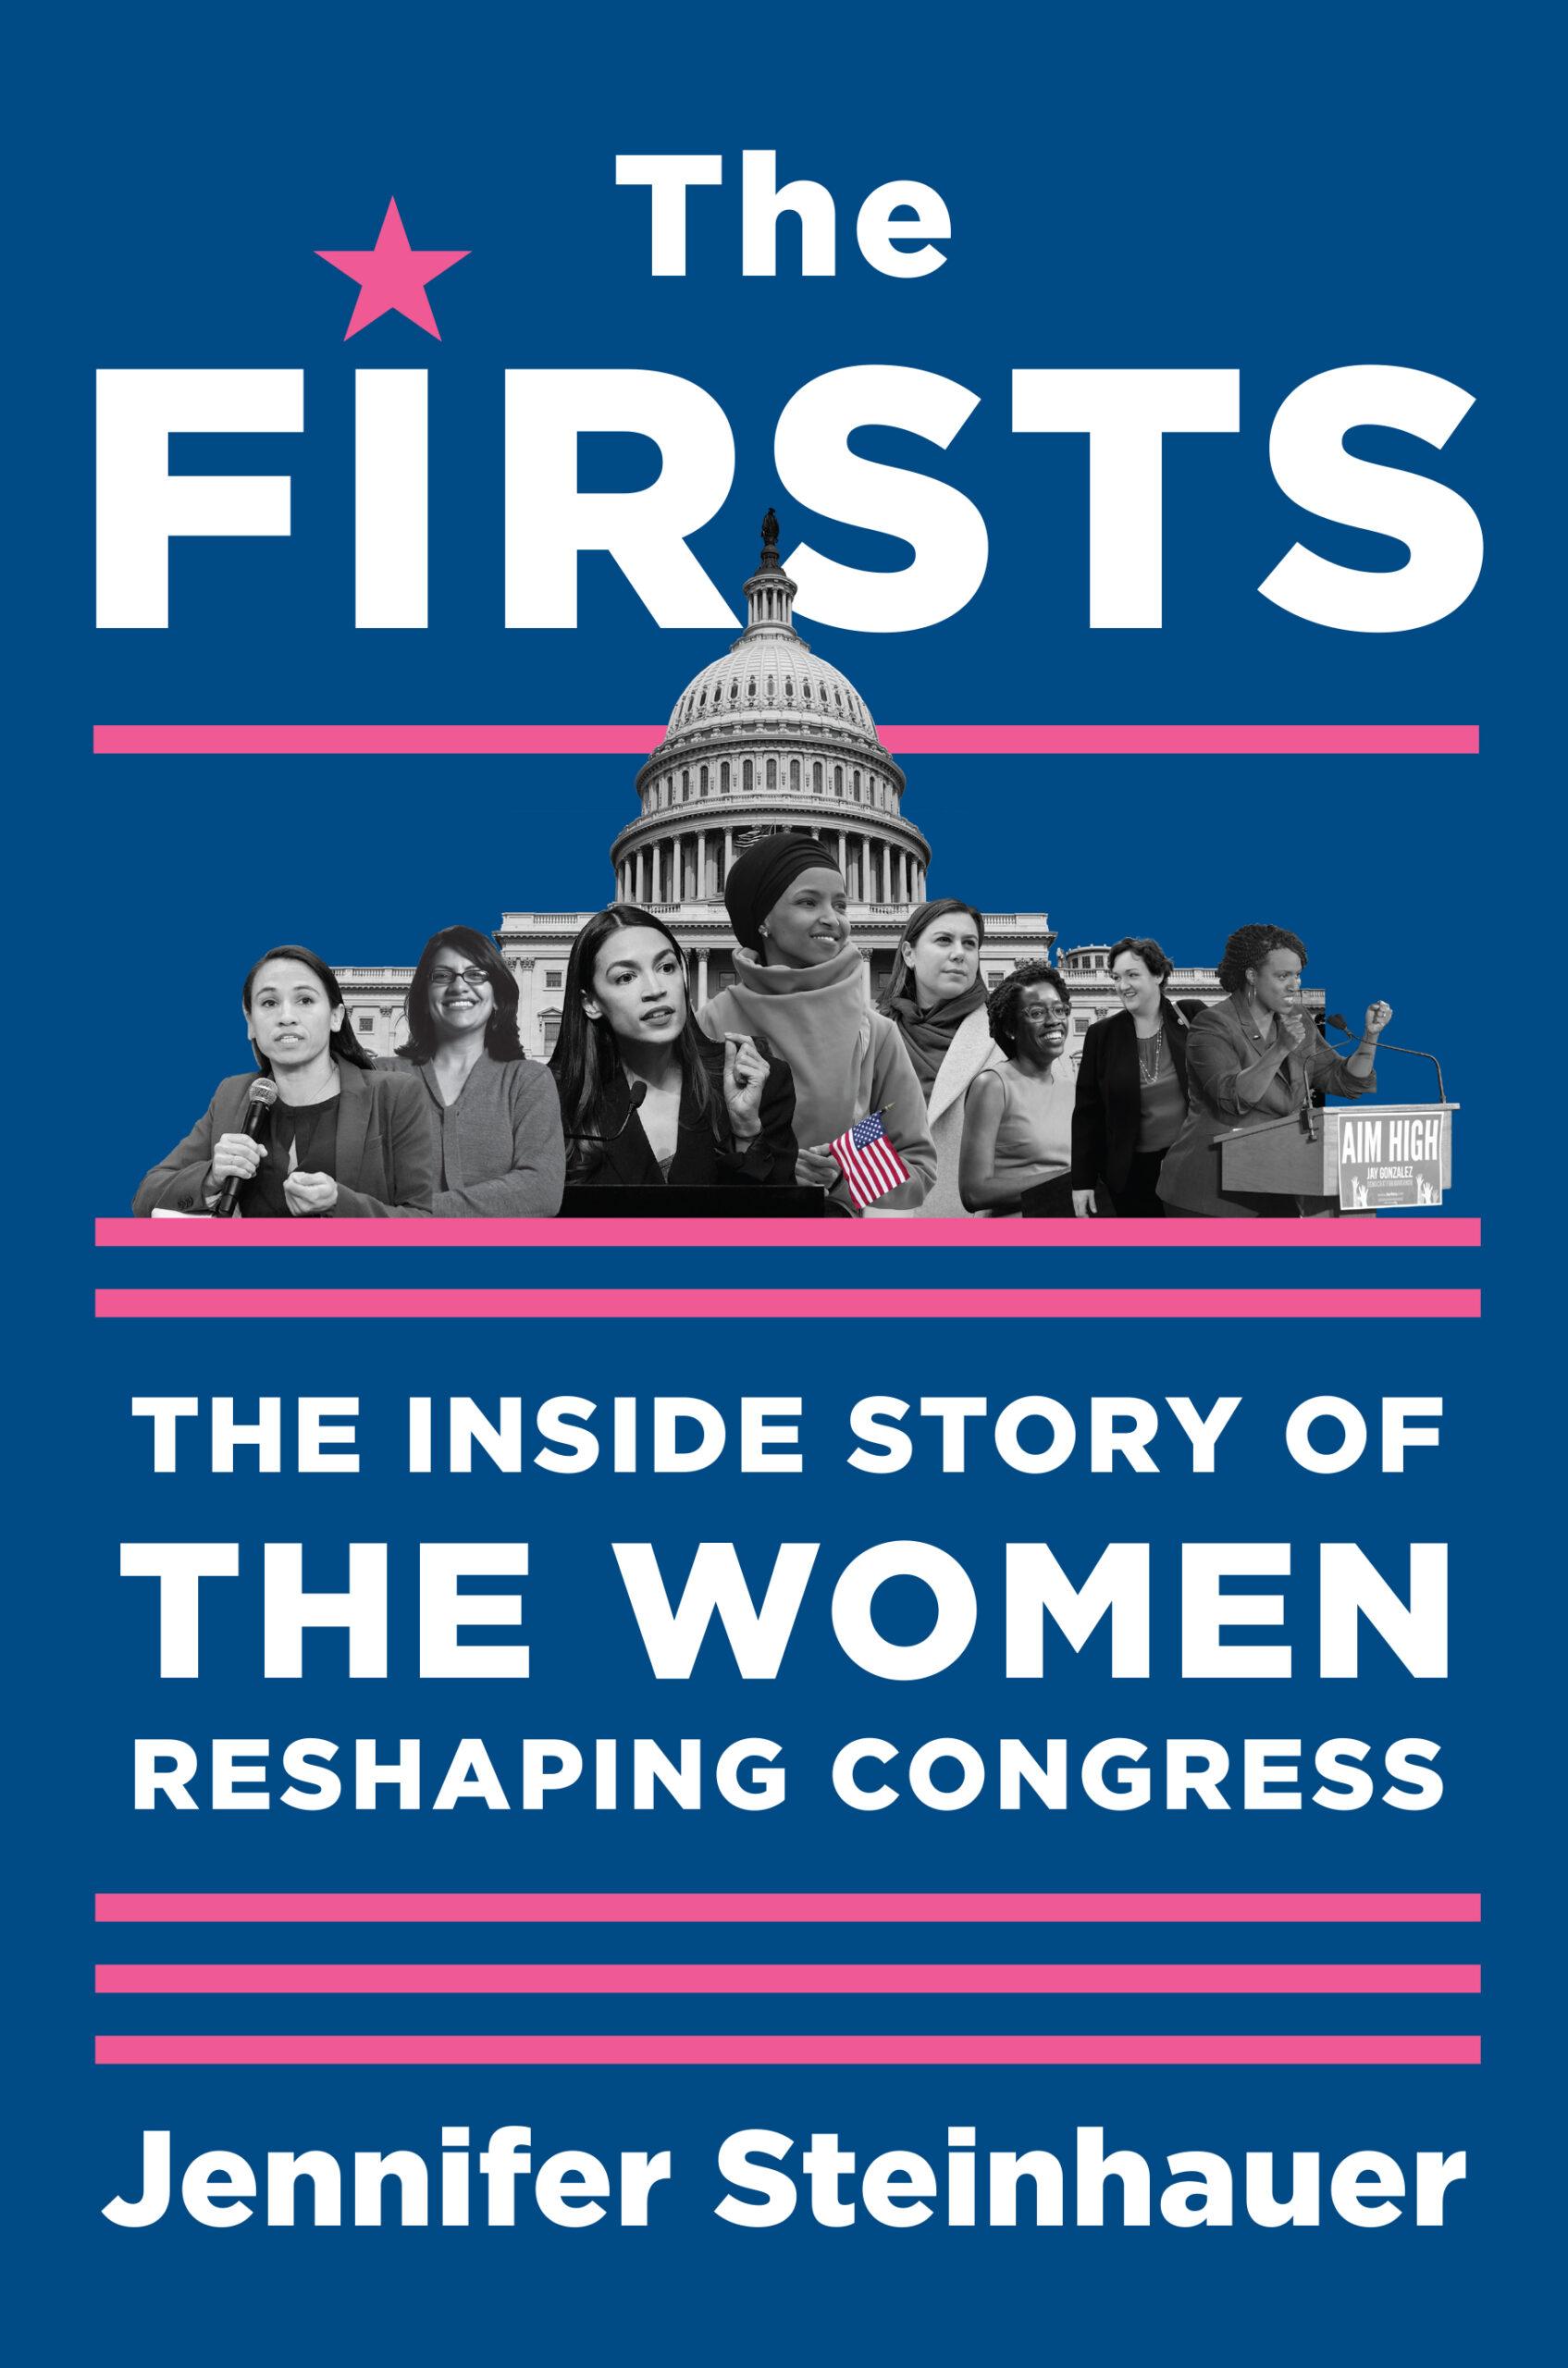 Reshaping Congress